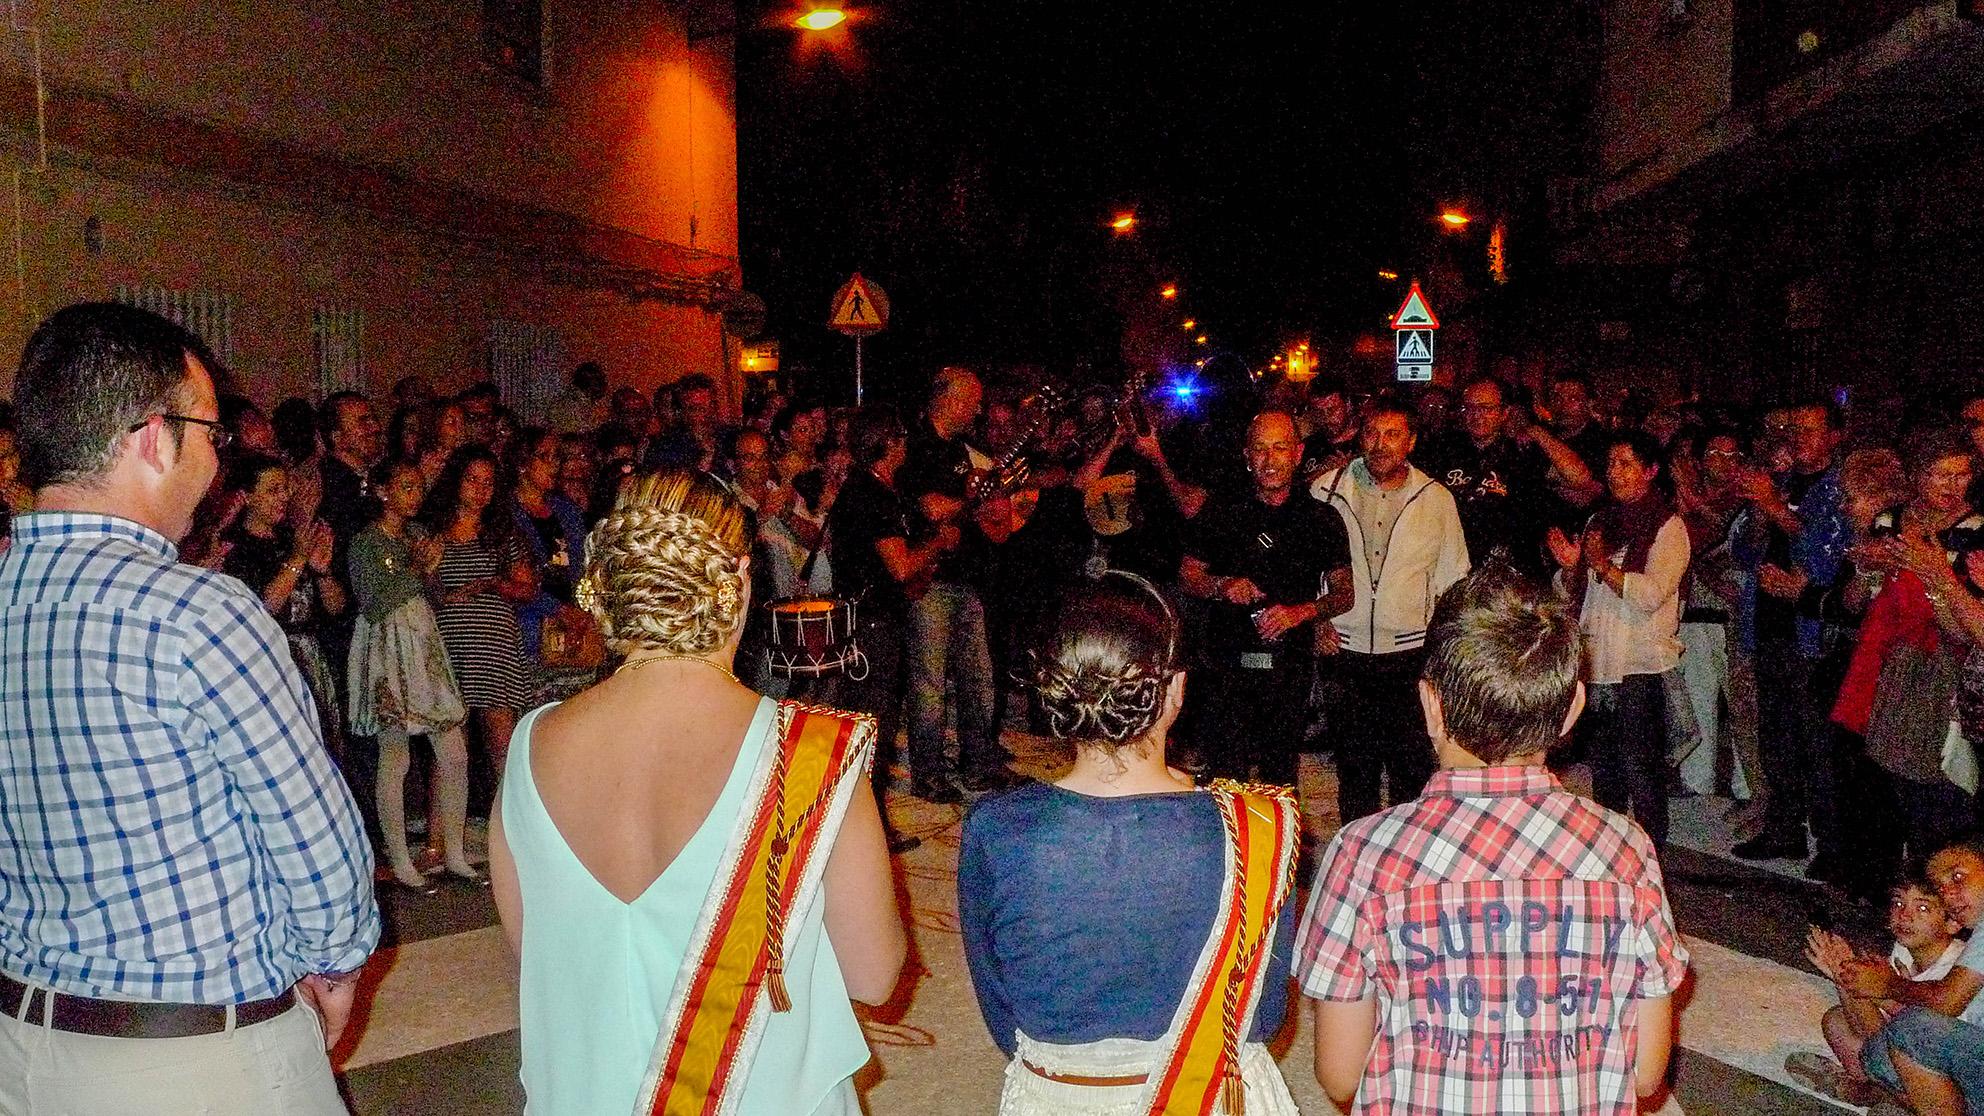 2014-06-07-Albaes d'Albal-Desemparats07 (35)